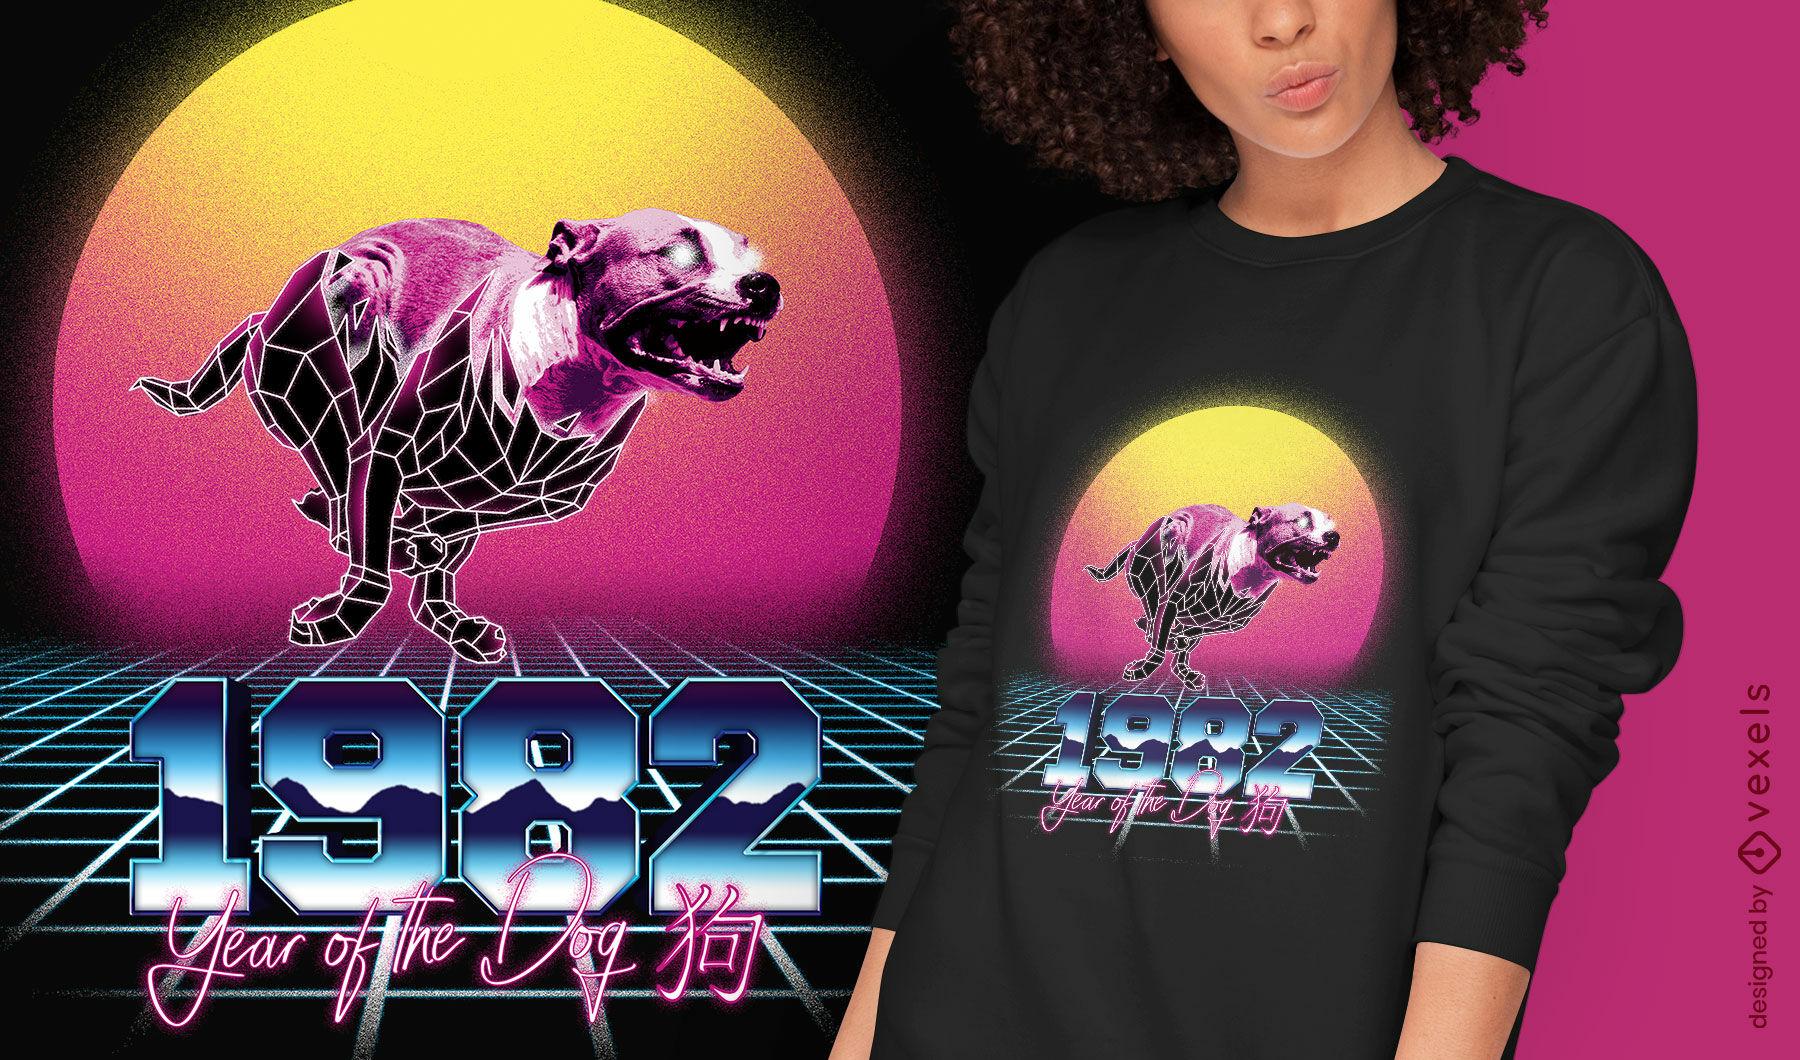 Dog chinese retrowave zodiac t-shirt psd